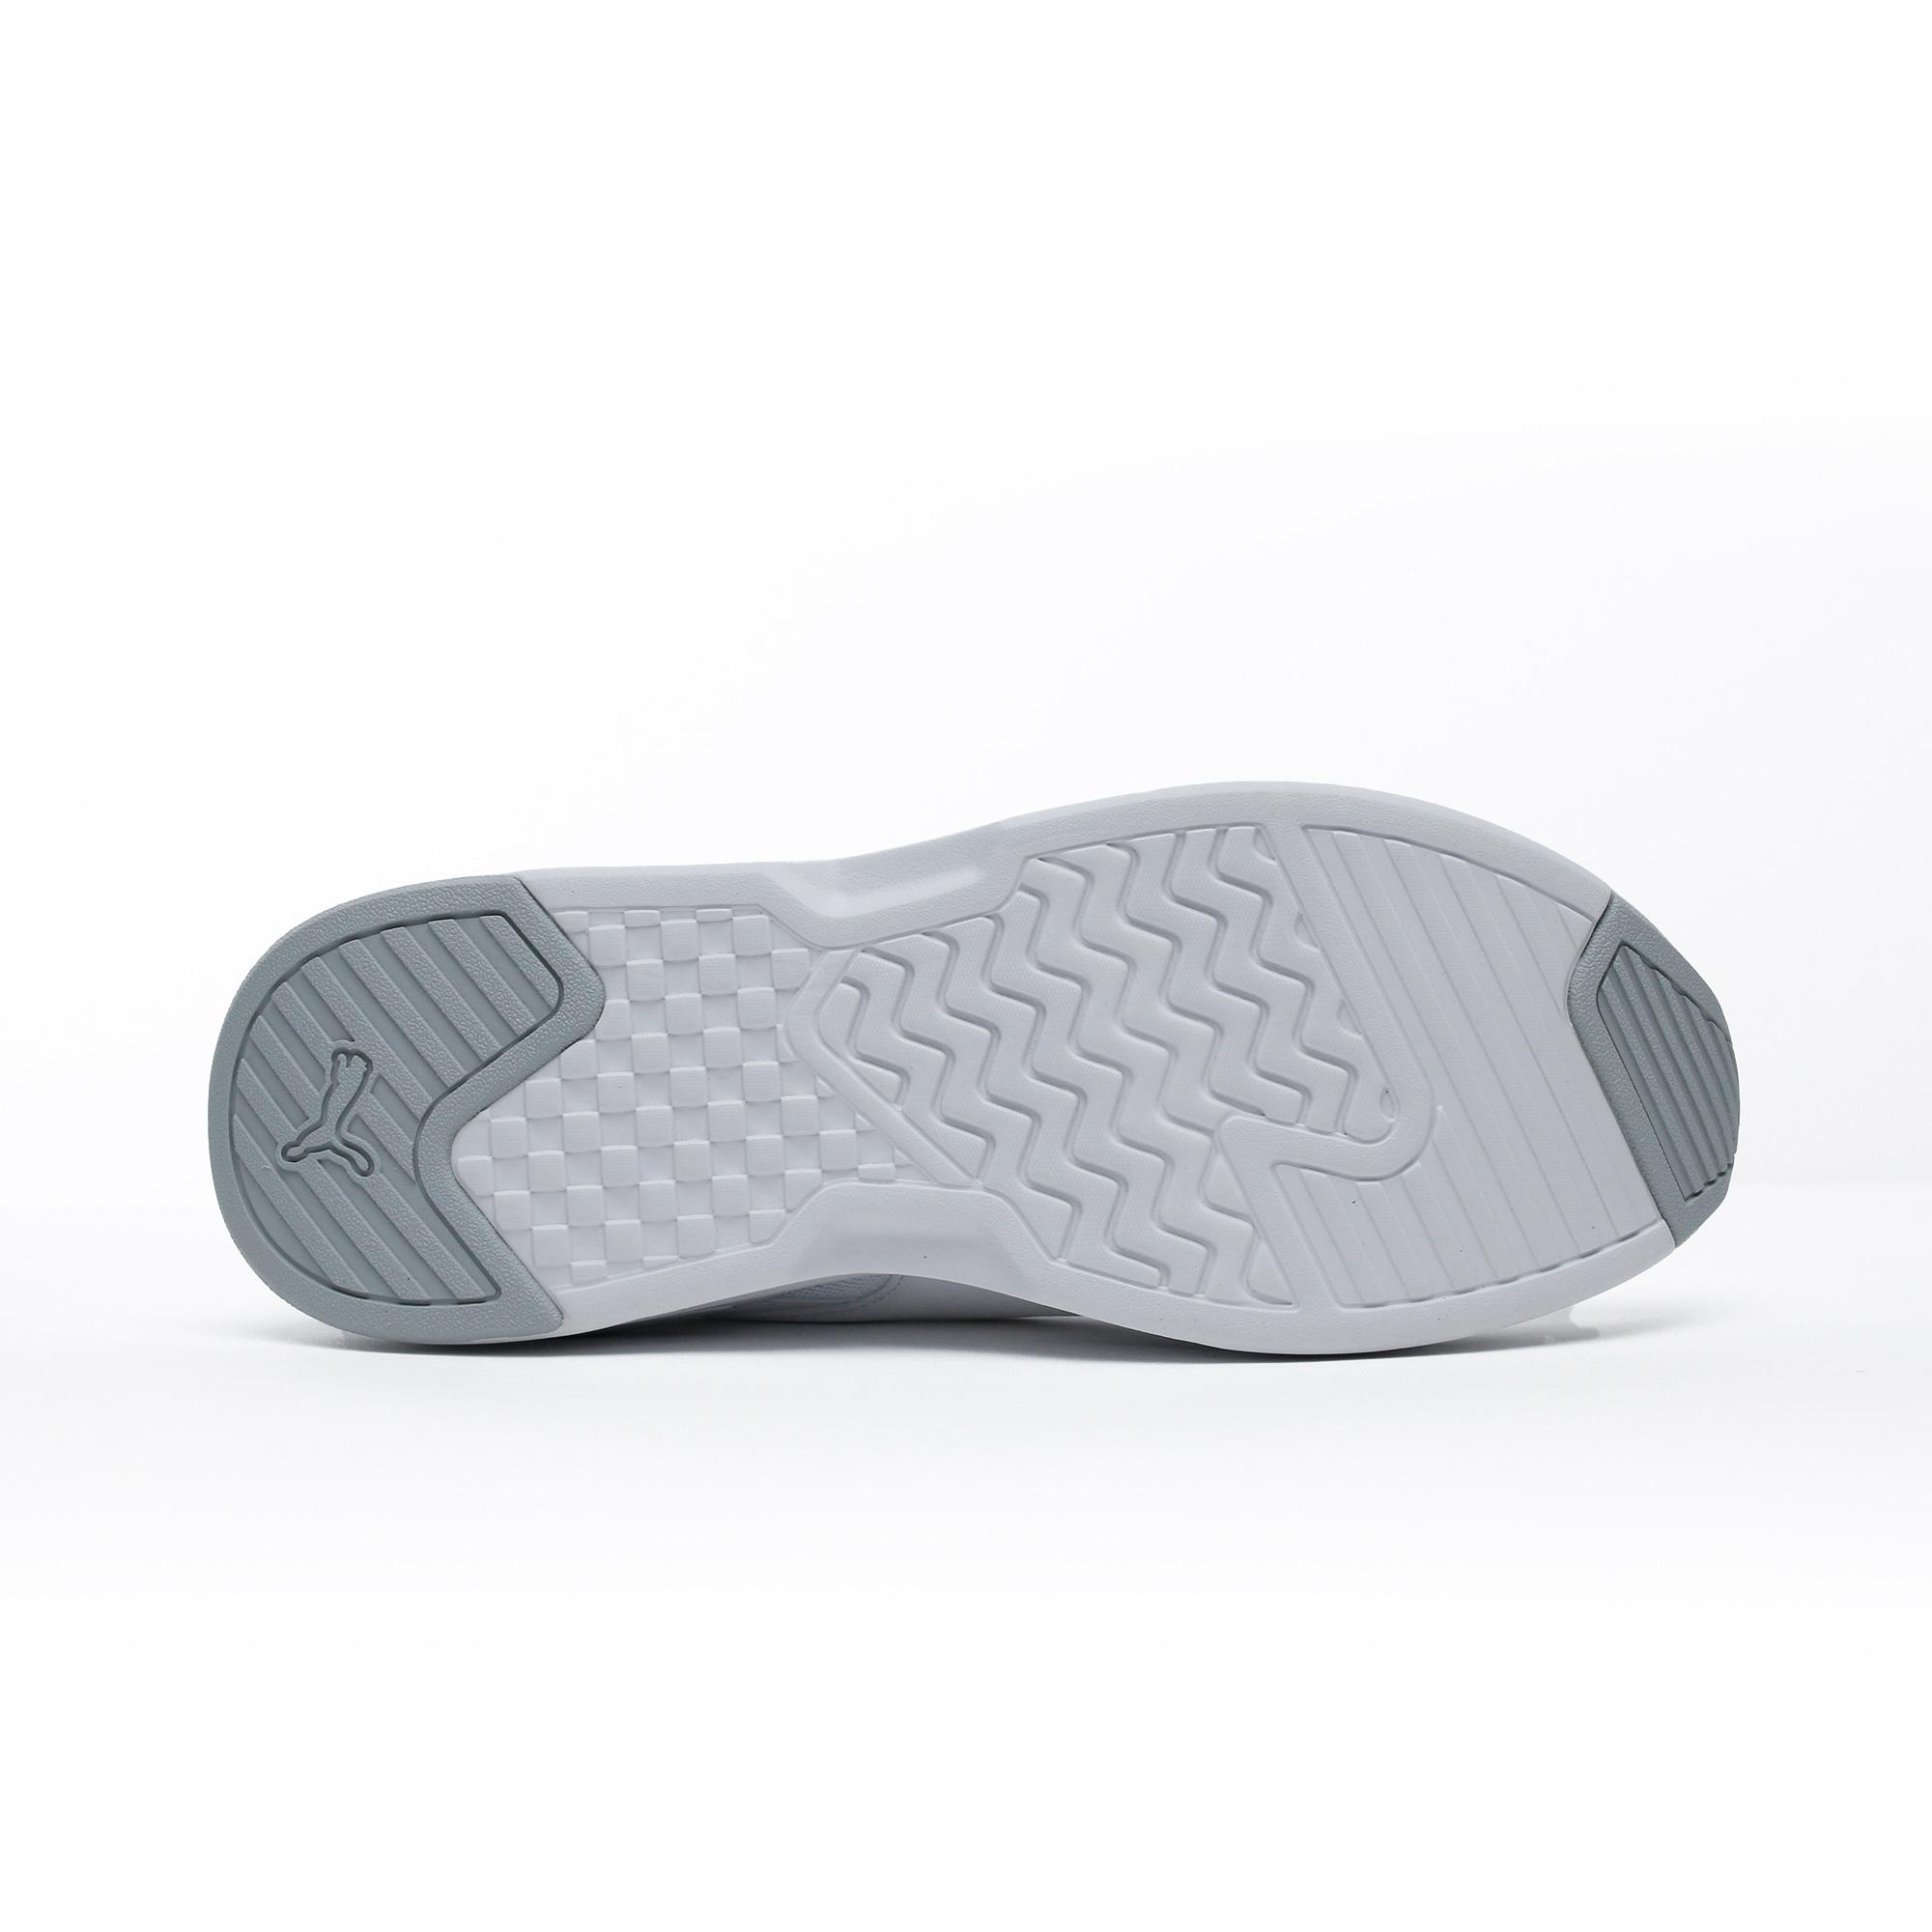 Puma X-Ray Lite Erkek Beyaz Spor Ayakkabı